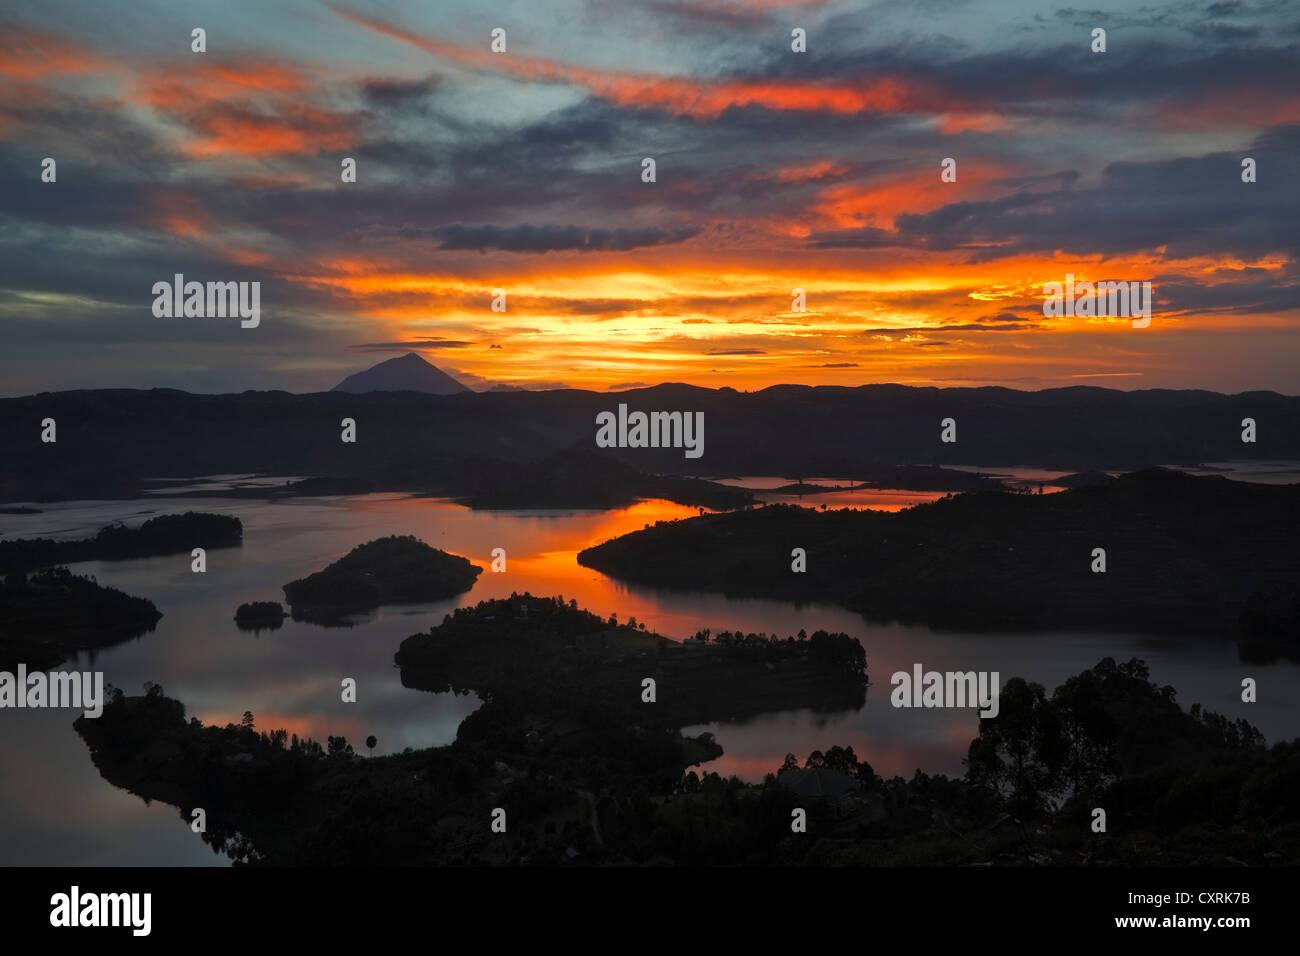 Bunyonyi lago al atardecer, Uganda, África Imagen De Stock